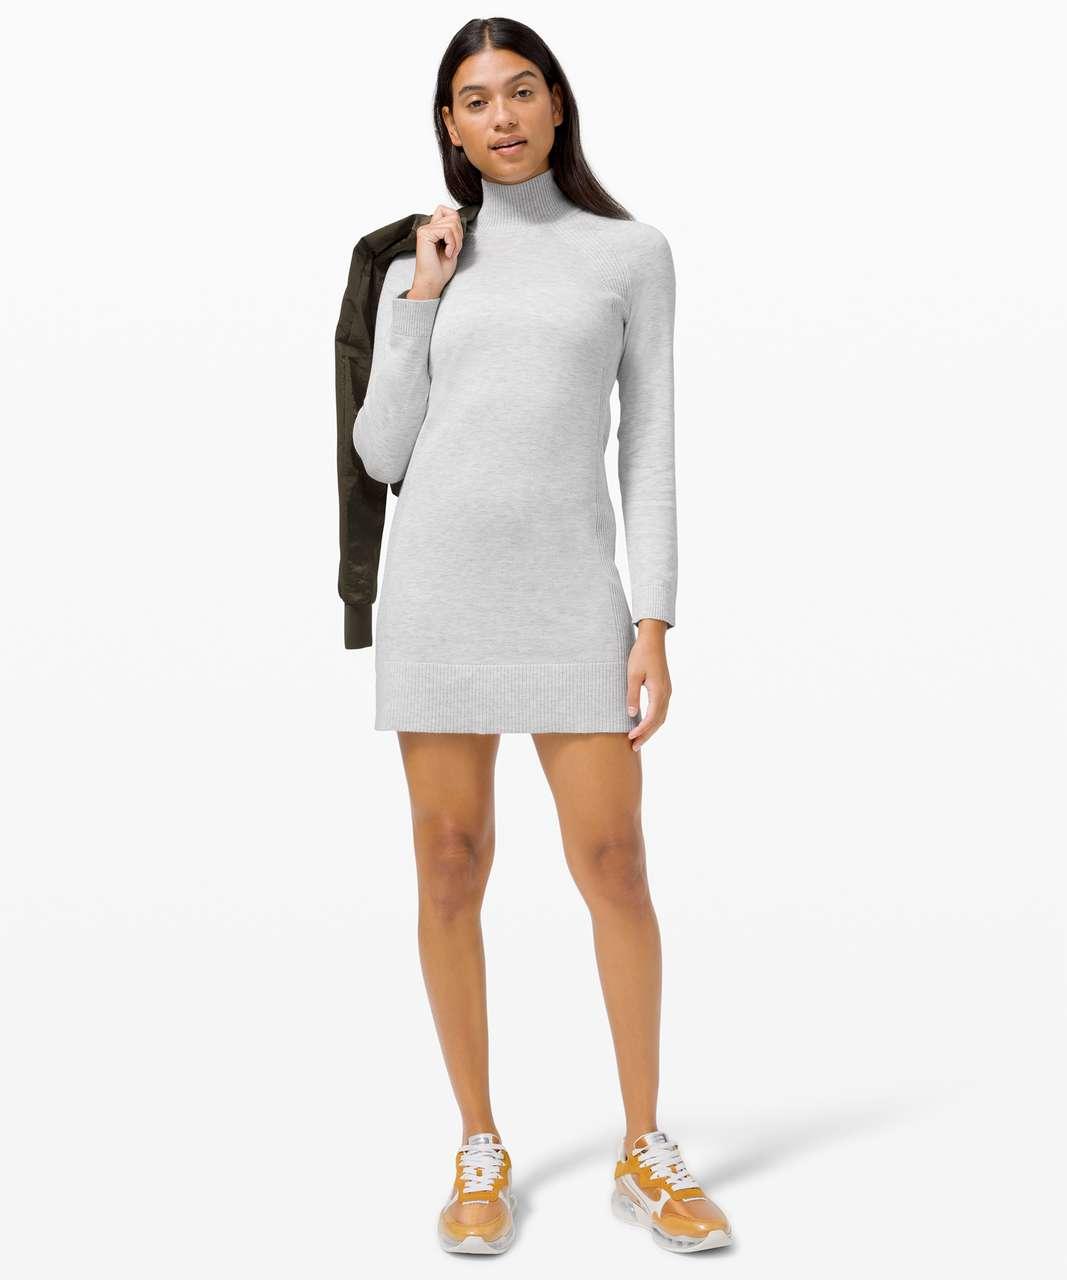 Lululemon Keep it Cozy Dress - Heathered Core Ultra Light Grey